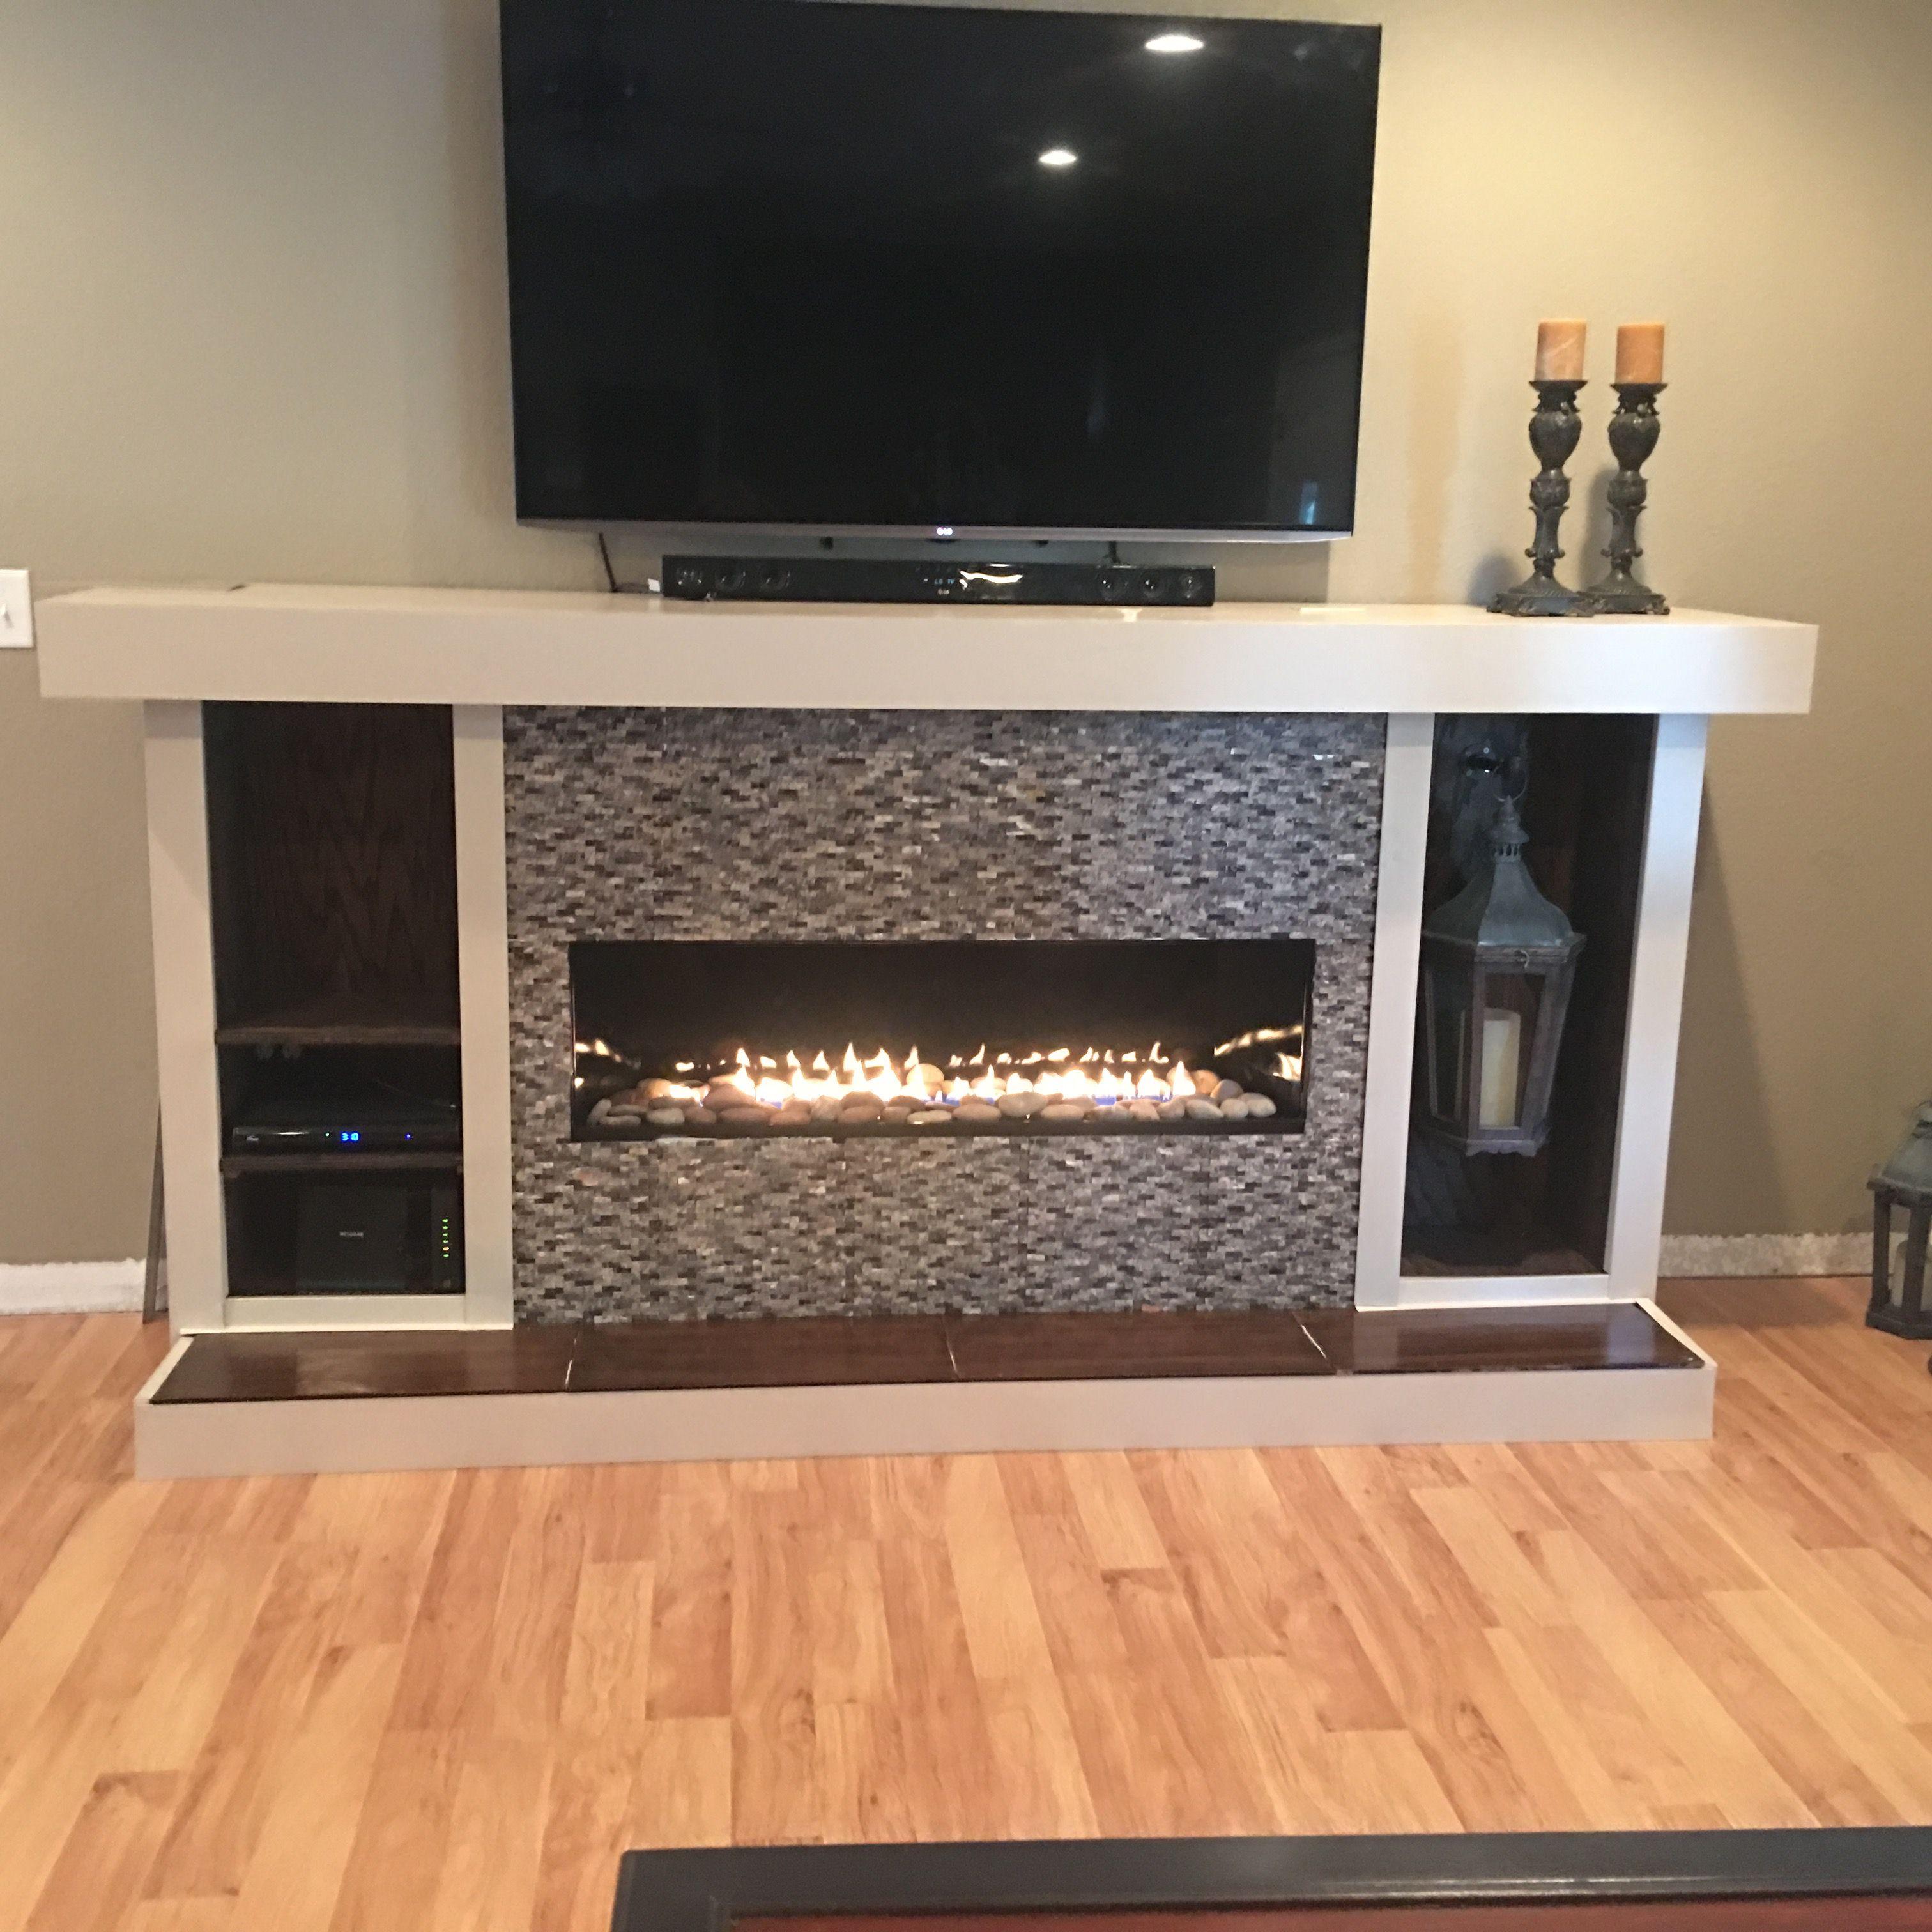 Free Standing Linear Ventless Gas Fireplace With Bookshelves Linear Fireplace Gas Fireplace Fireplace Bookshelves